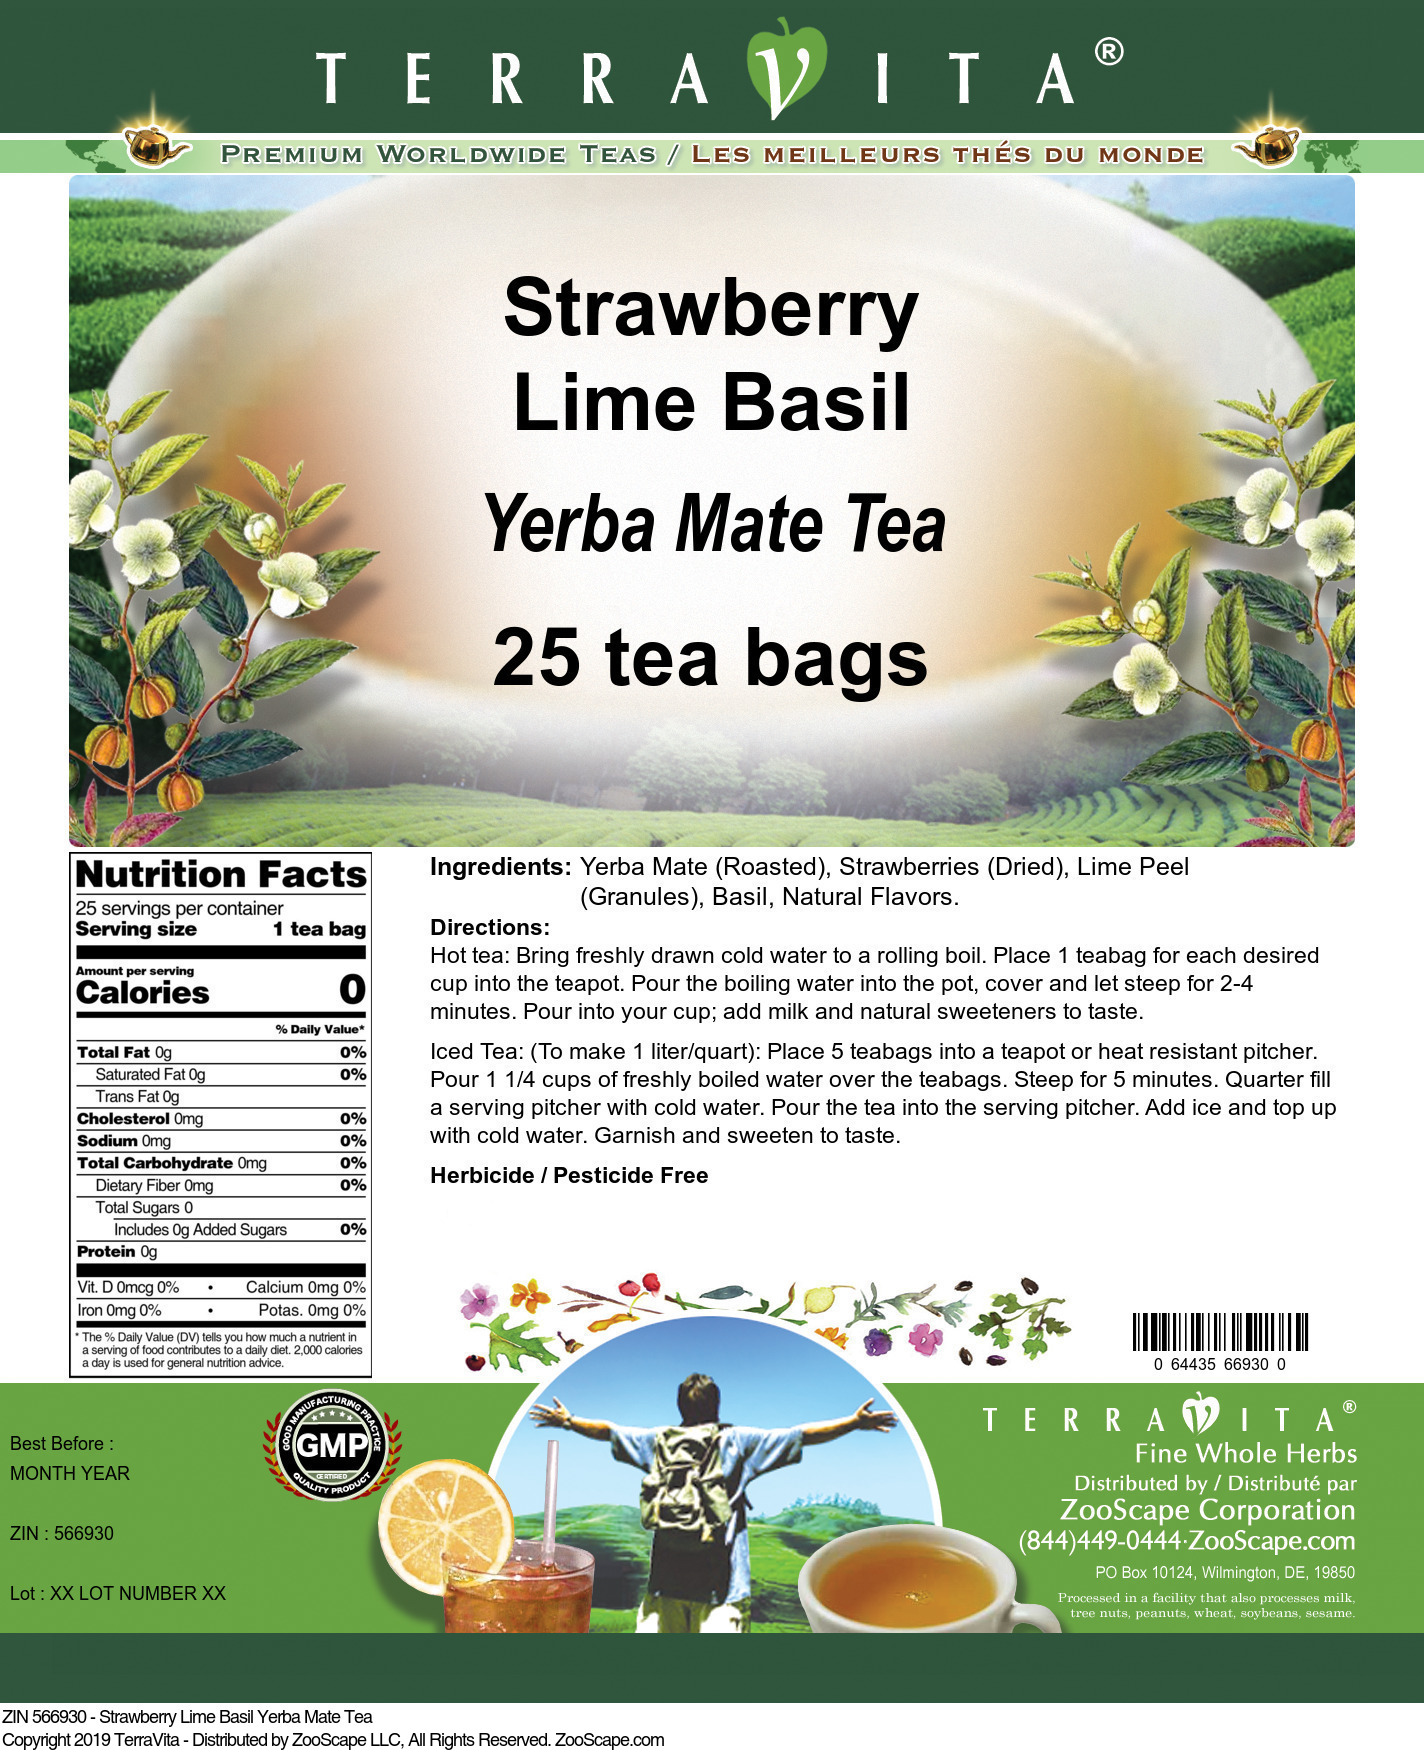 Strawberry Lime Basil Yerba Mate Tea